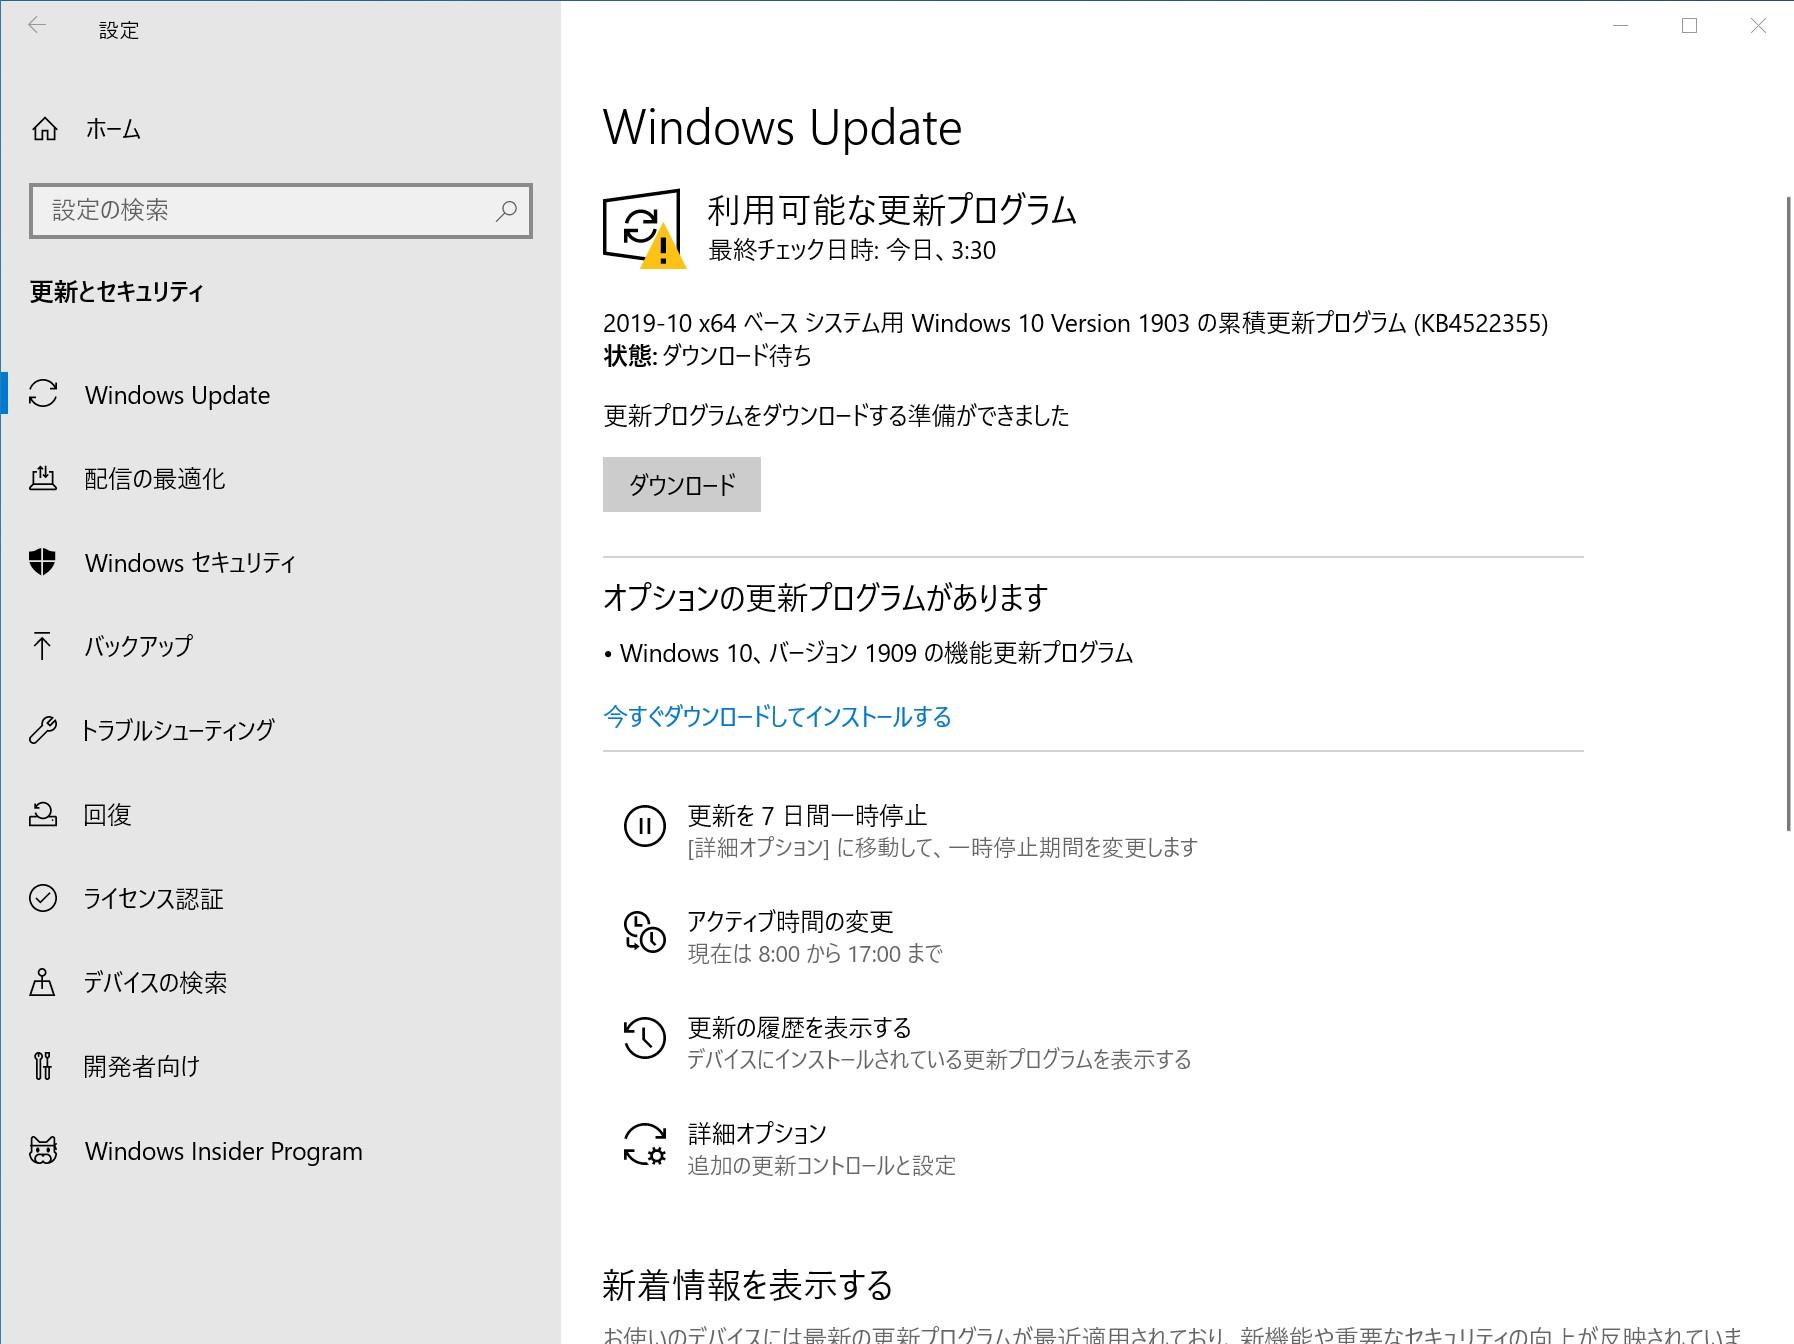 """Windows Update""を利用したアップグレード(スクリーンショットは「November 2019 Update(バージョン 1909)」のもの)"